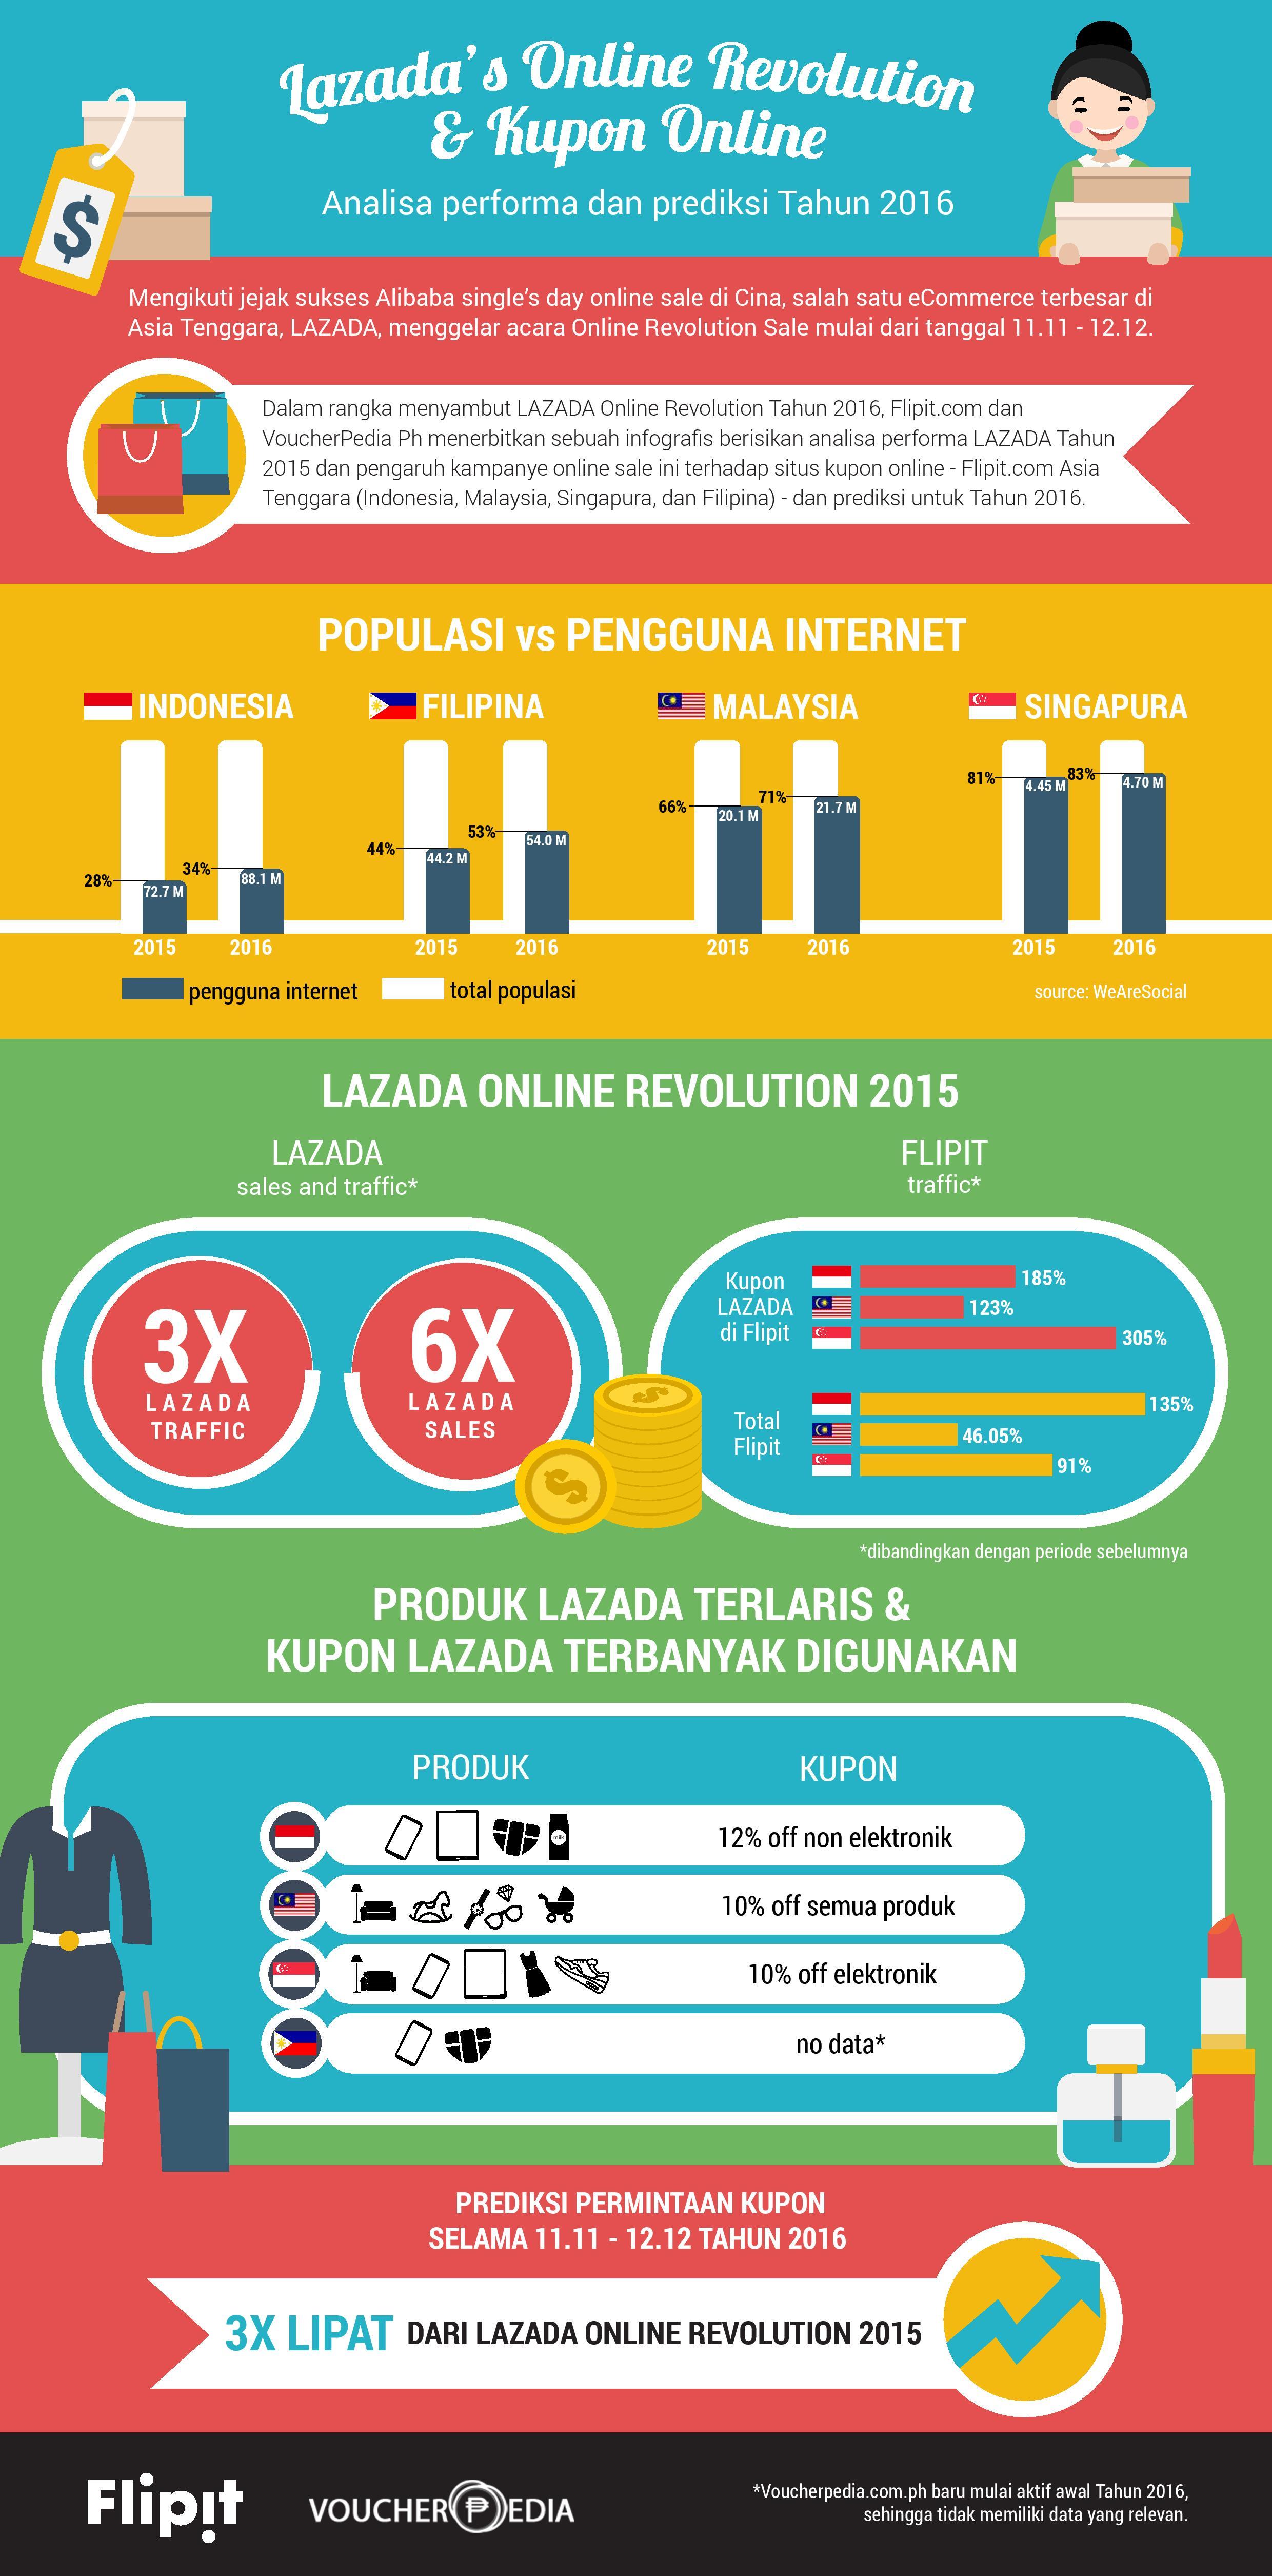 infographic-lazada-flipit